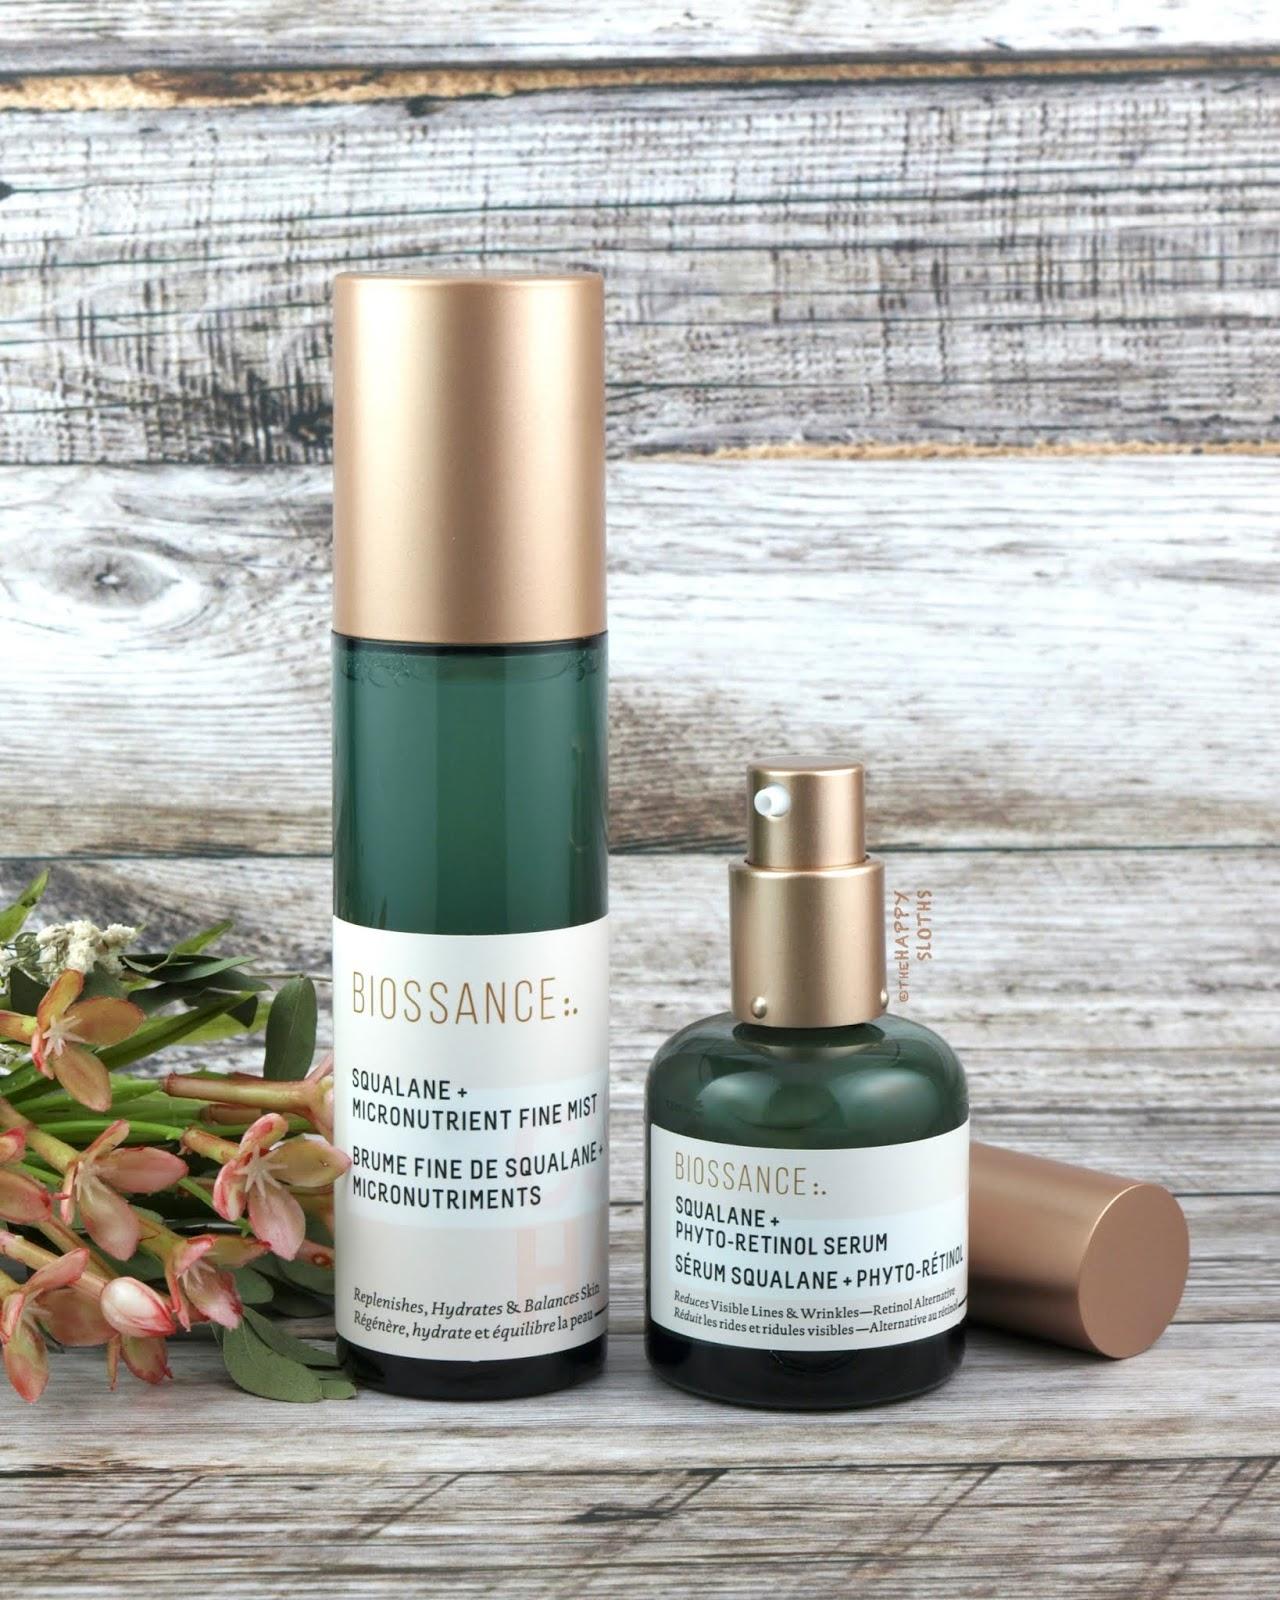 Biossance | Squalane + Micronutrient Fine Mist & Squalane + Phyto-Retinol Serum: Review